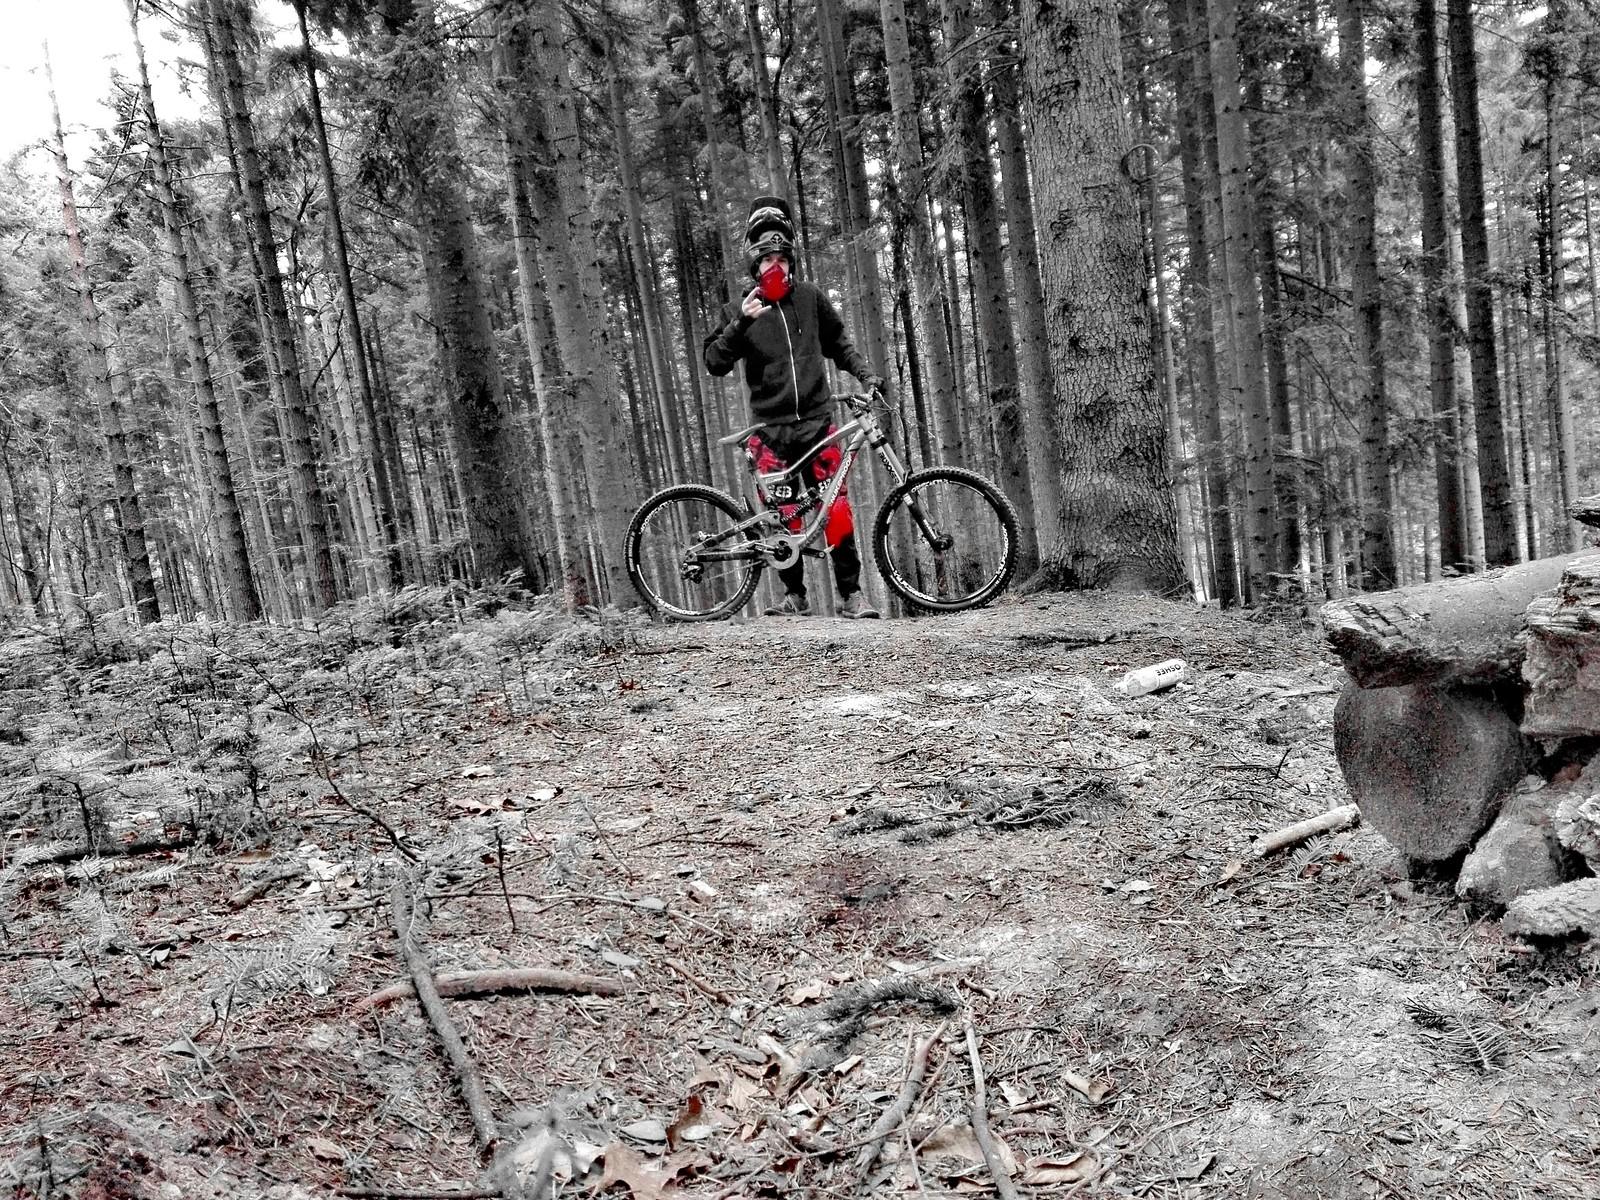 Nukeproof Scalp - Michalglowacz1 - Mountain Biking Pictures - Vital MTB